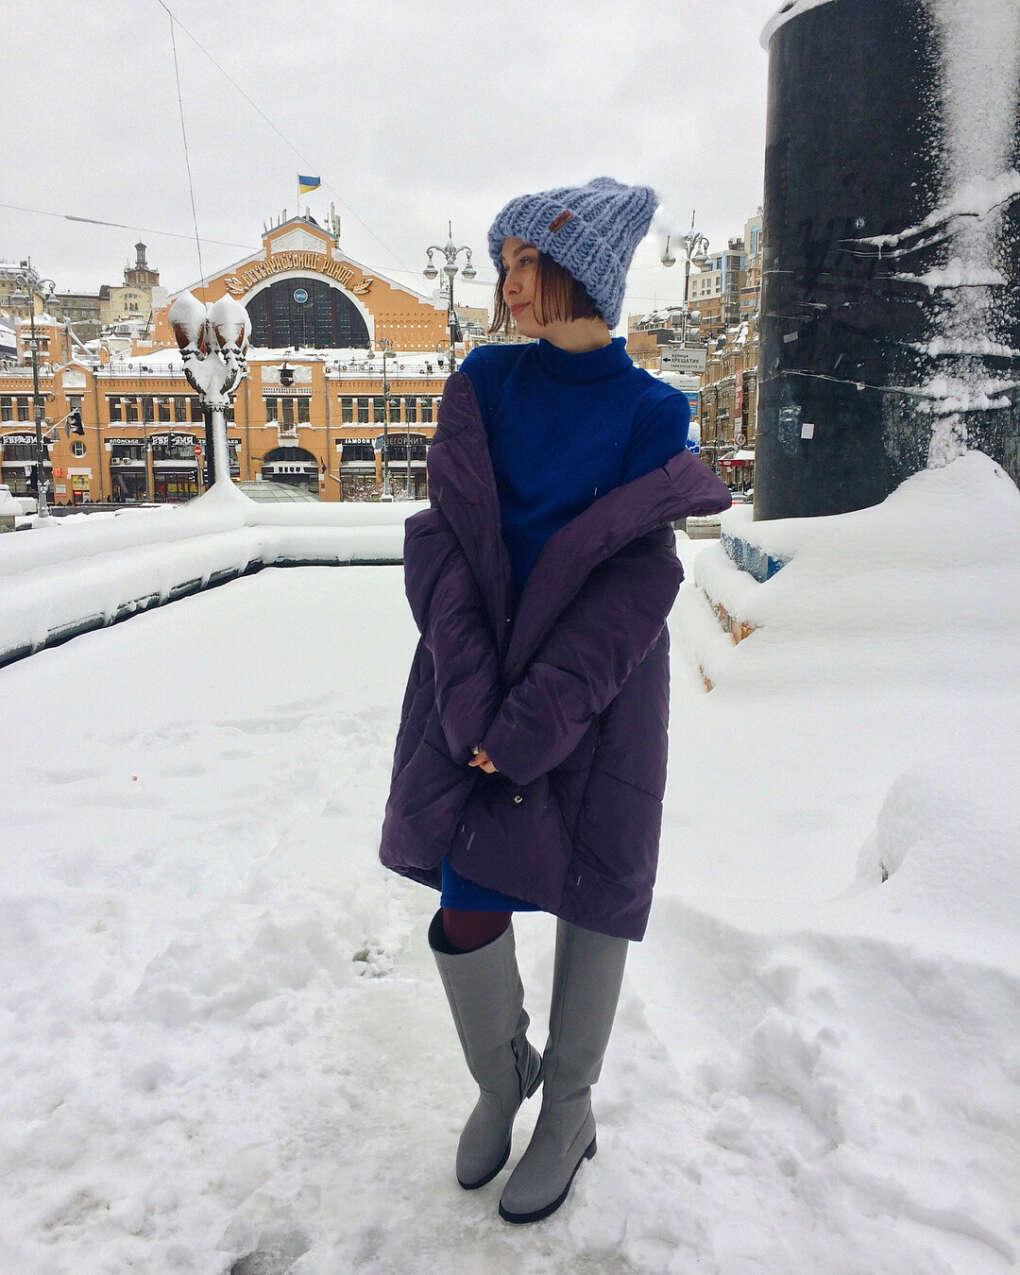 Instagram post by Магазин украинских марок